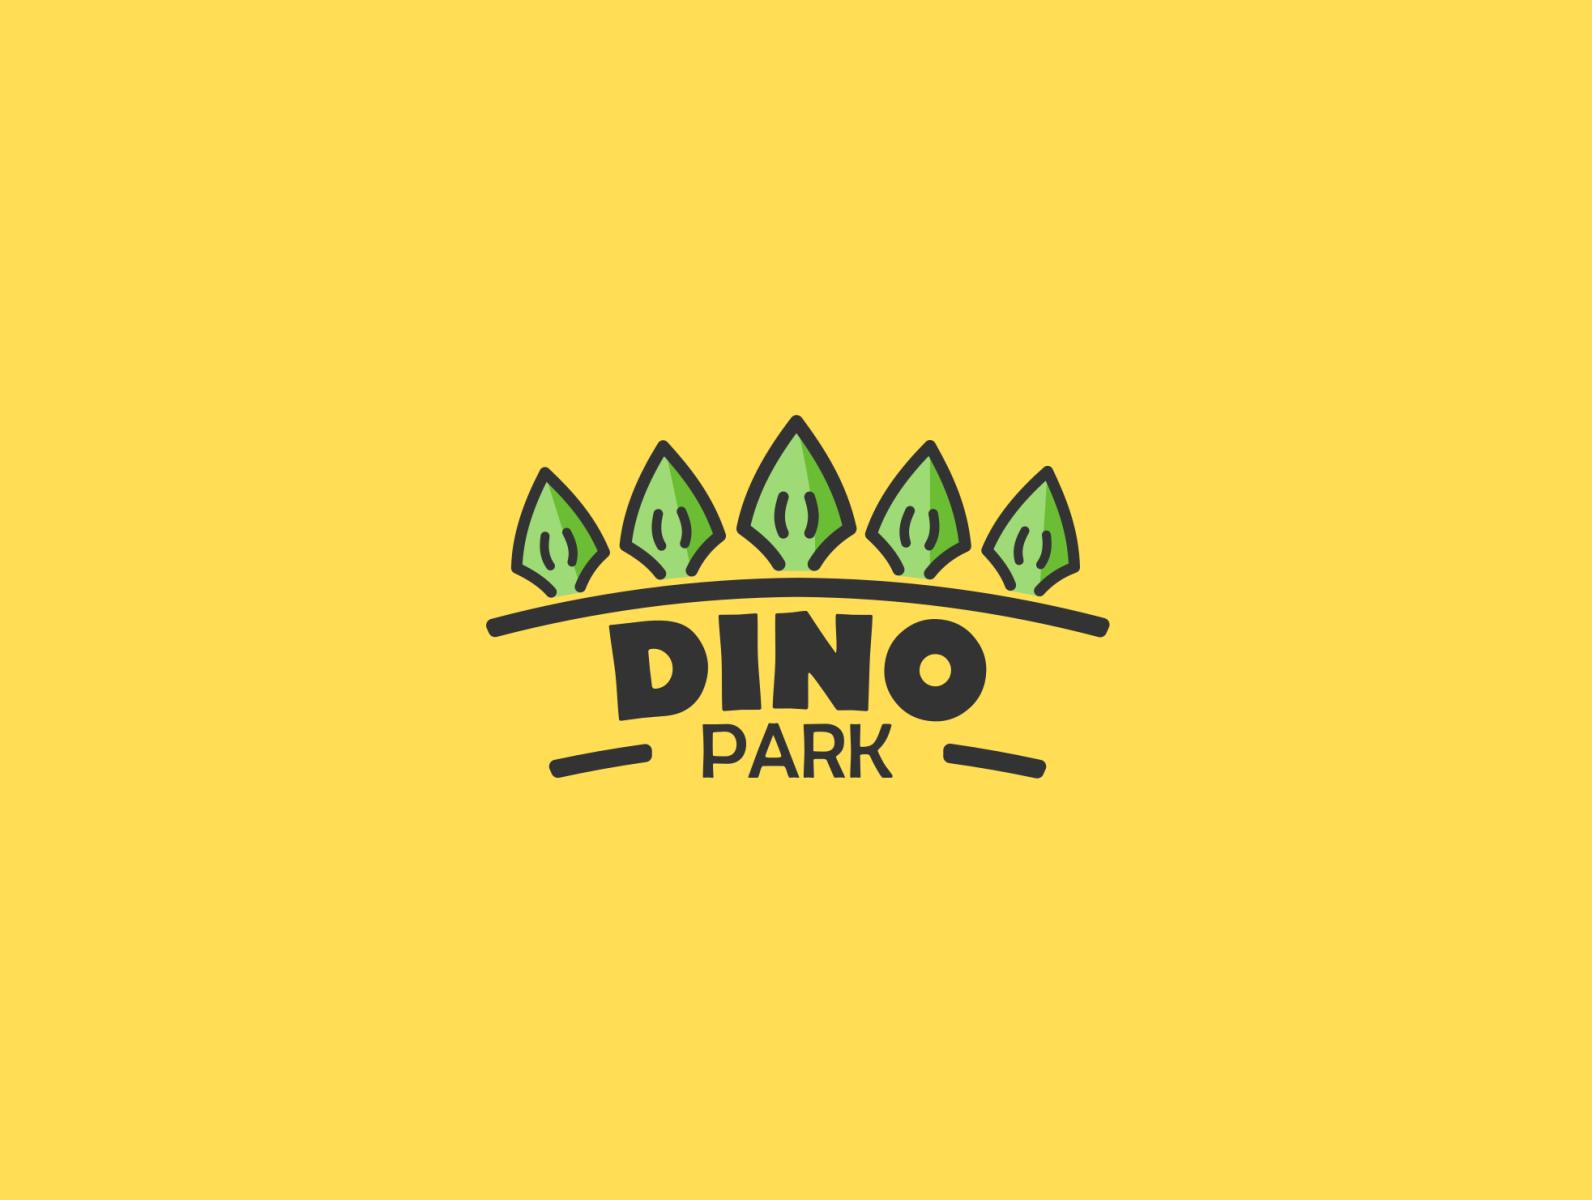 Daily Logo Challenge 35 50 Dinosaur Amusement Park Dino Park By Andrew On Dribbble